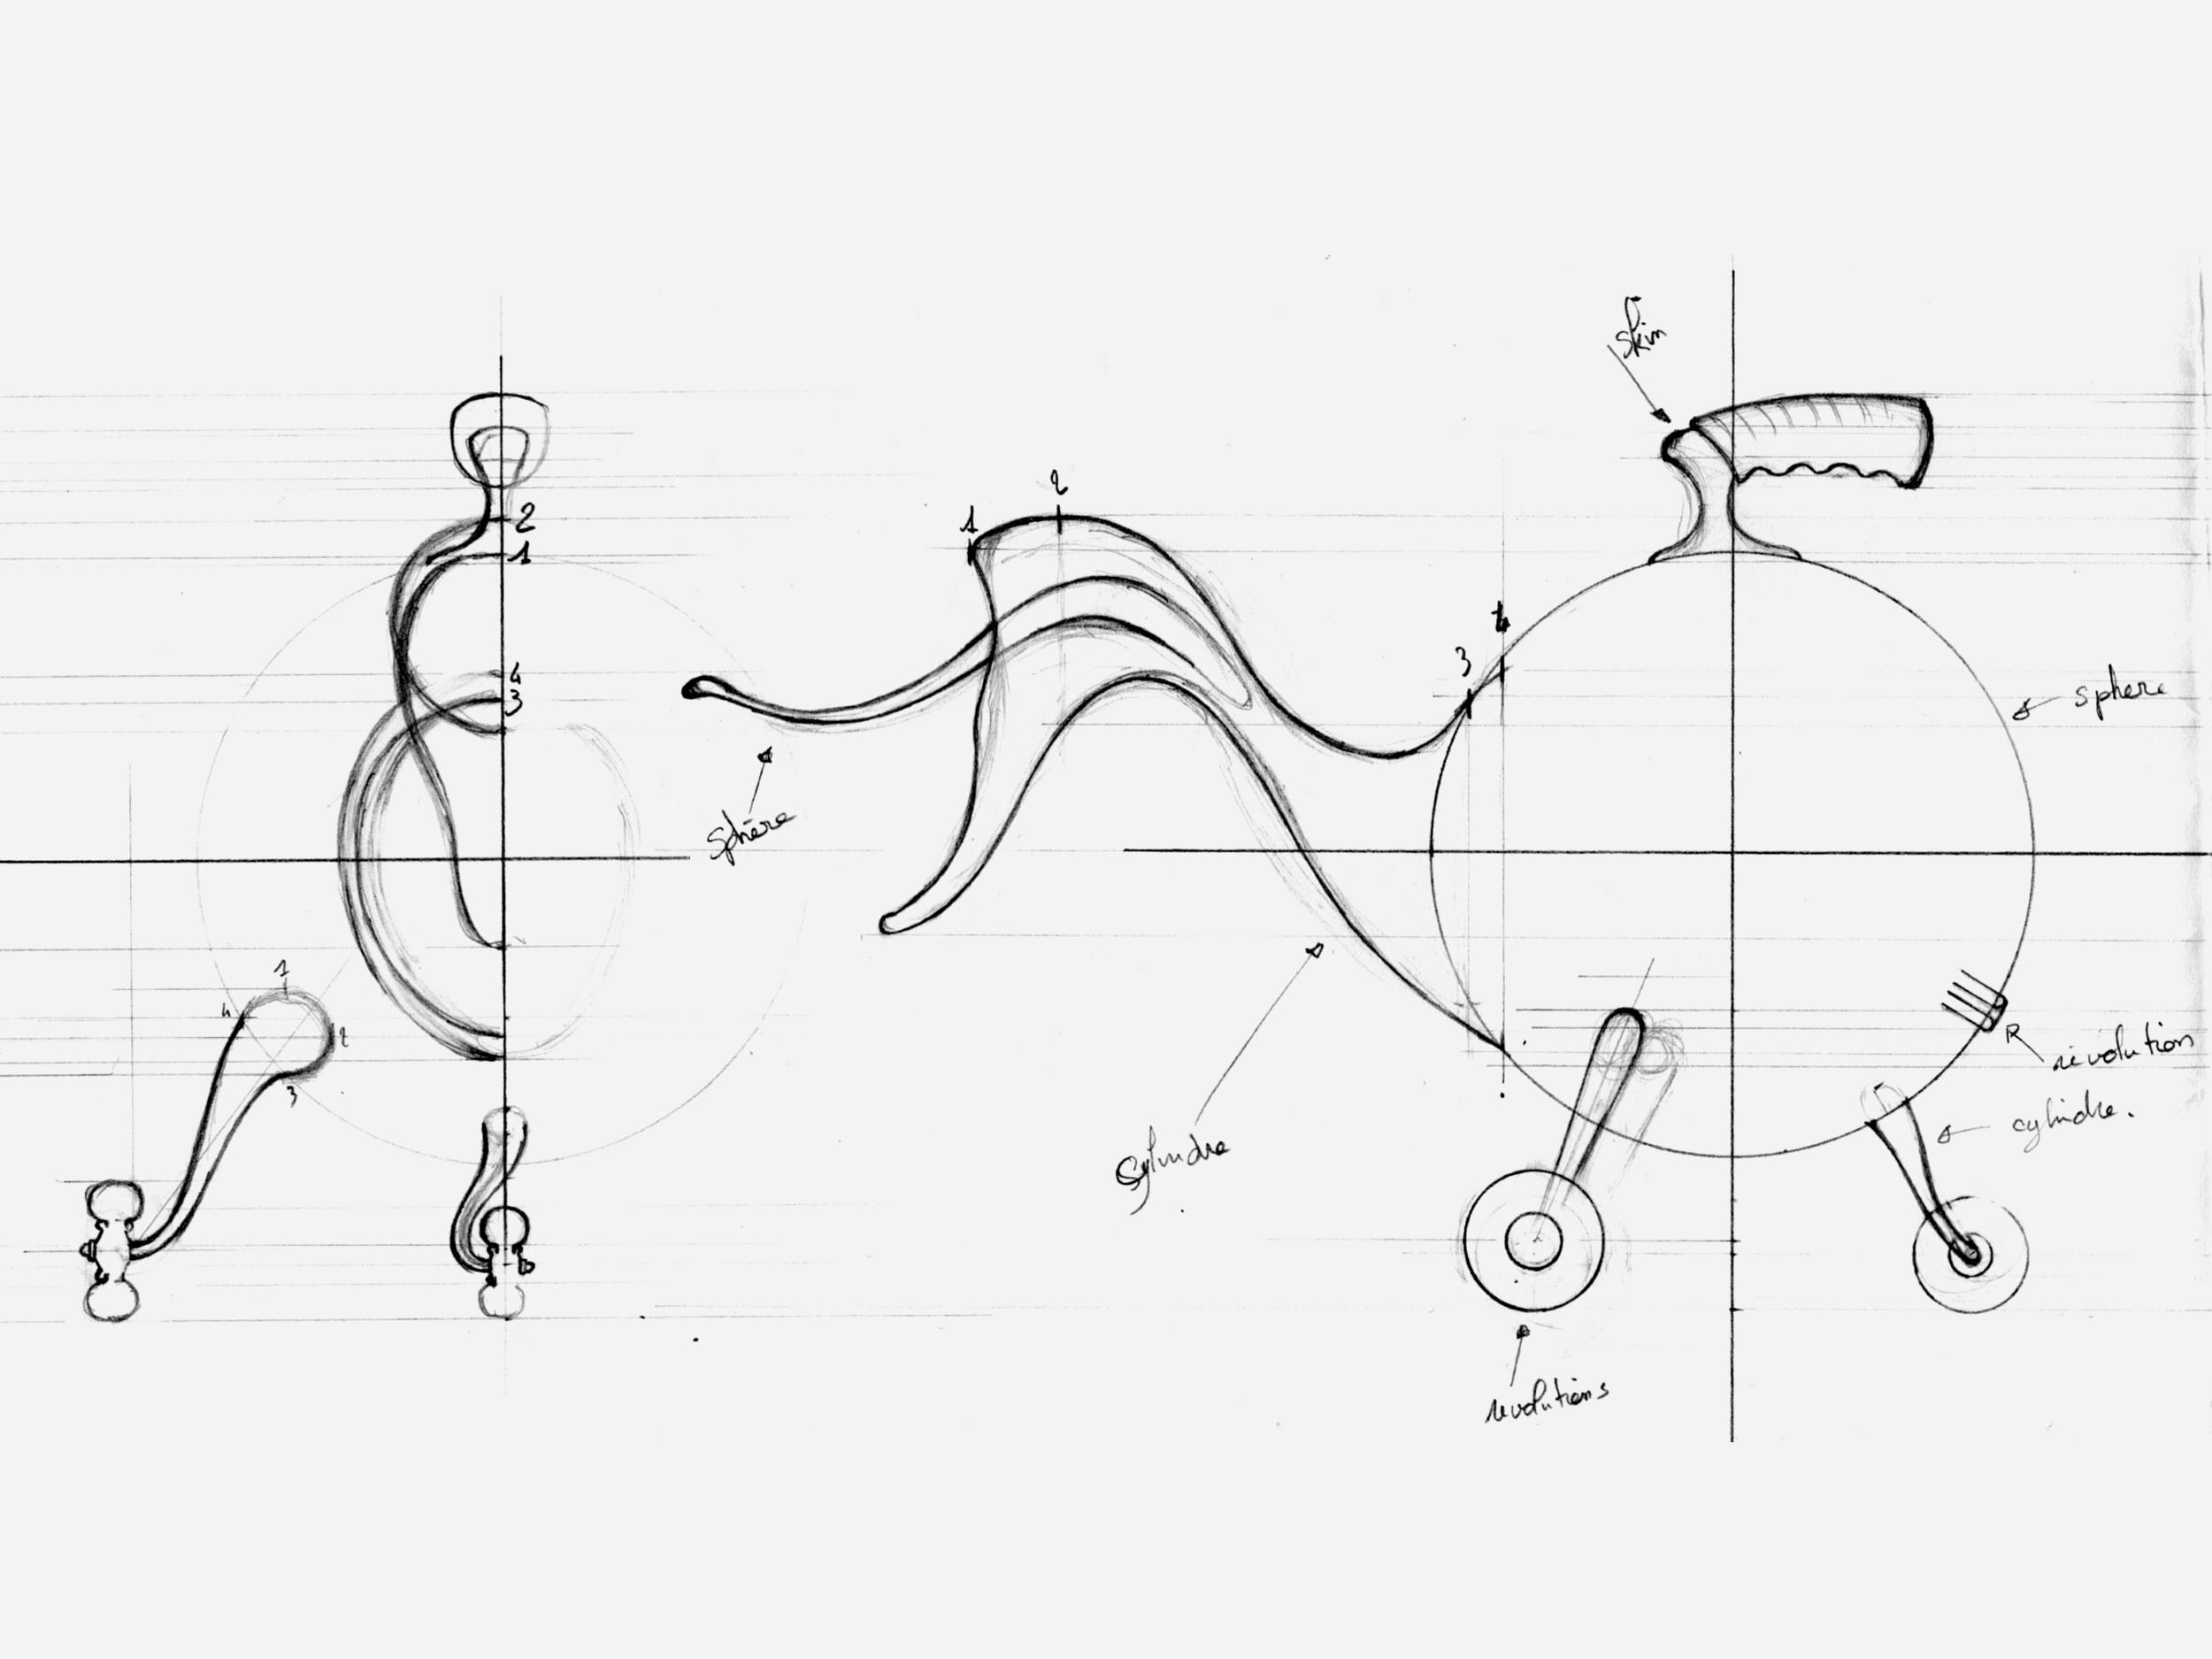 B_obj02_Sketch2